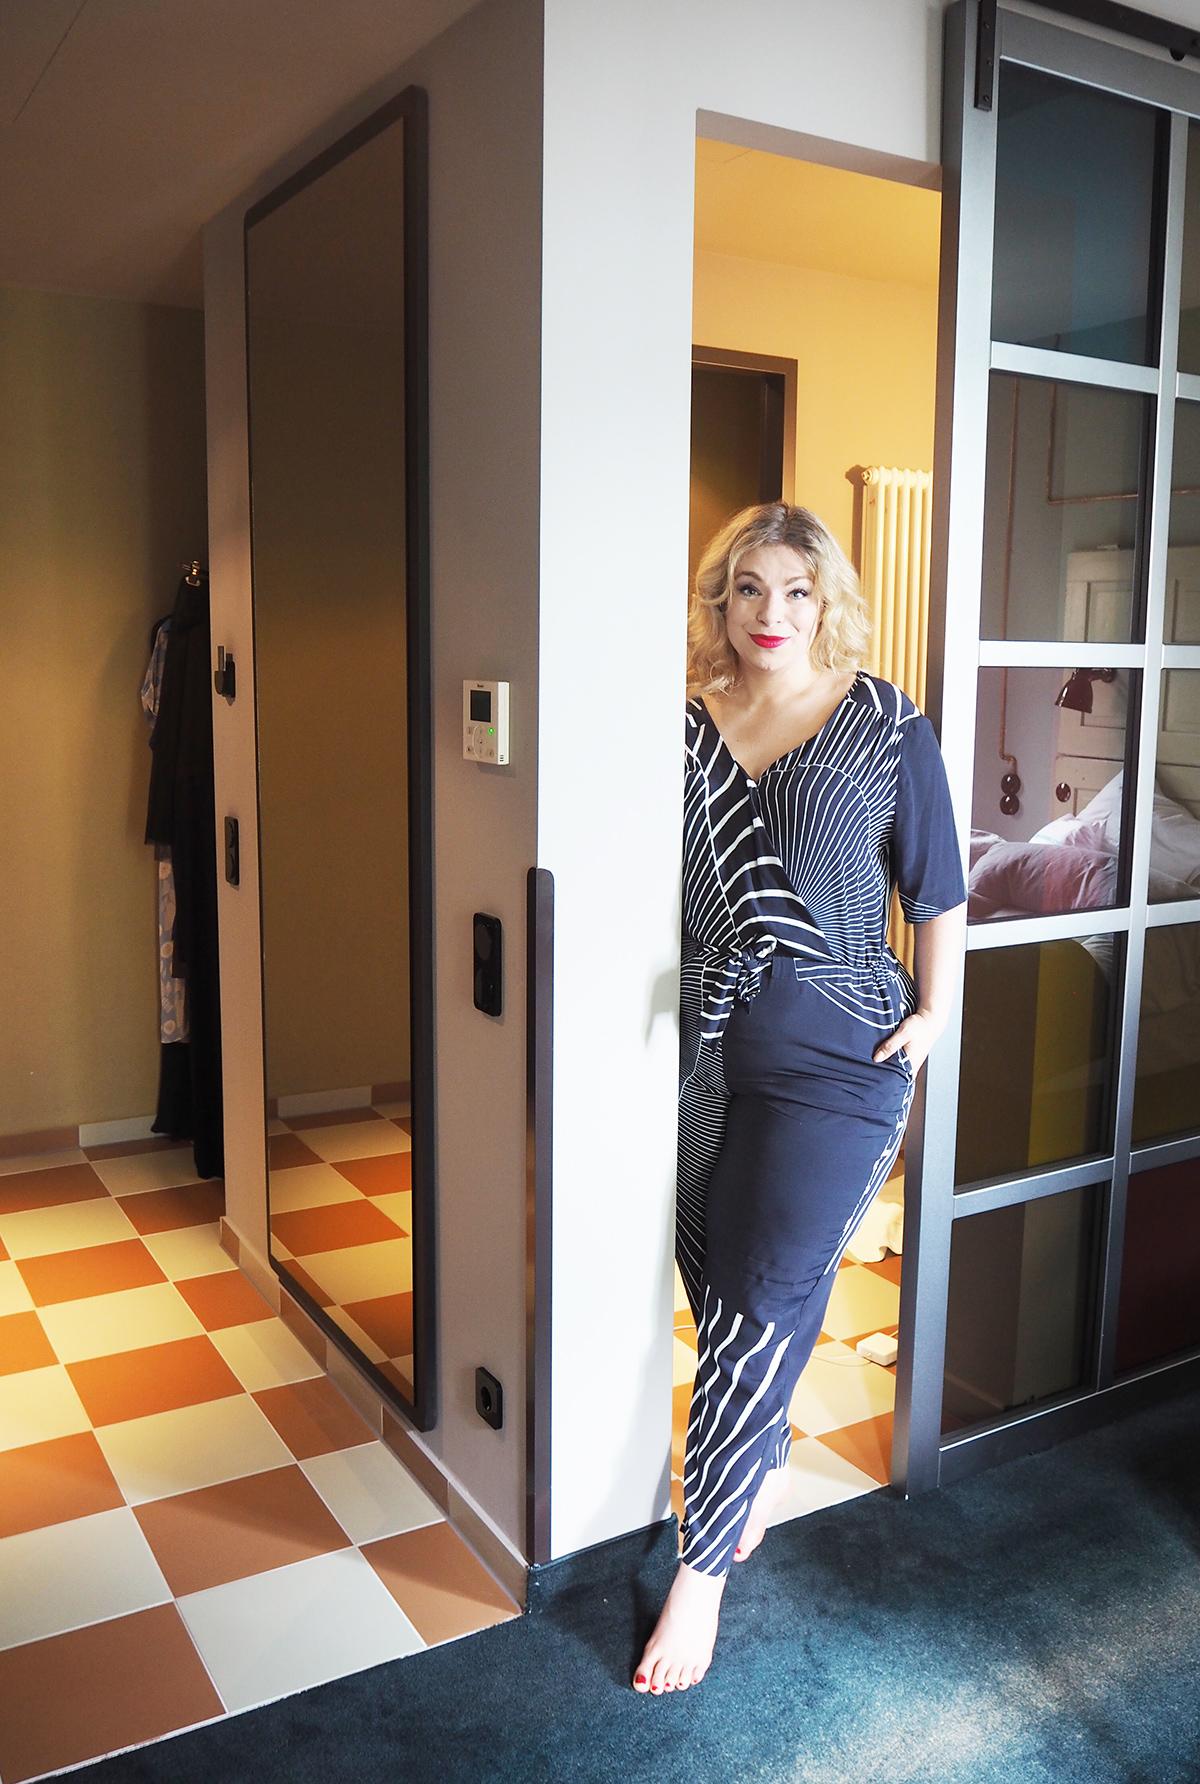 Caterina-Pogorzelski-25hour-Hotel-Megabambi